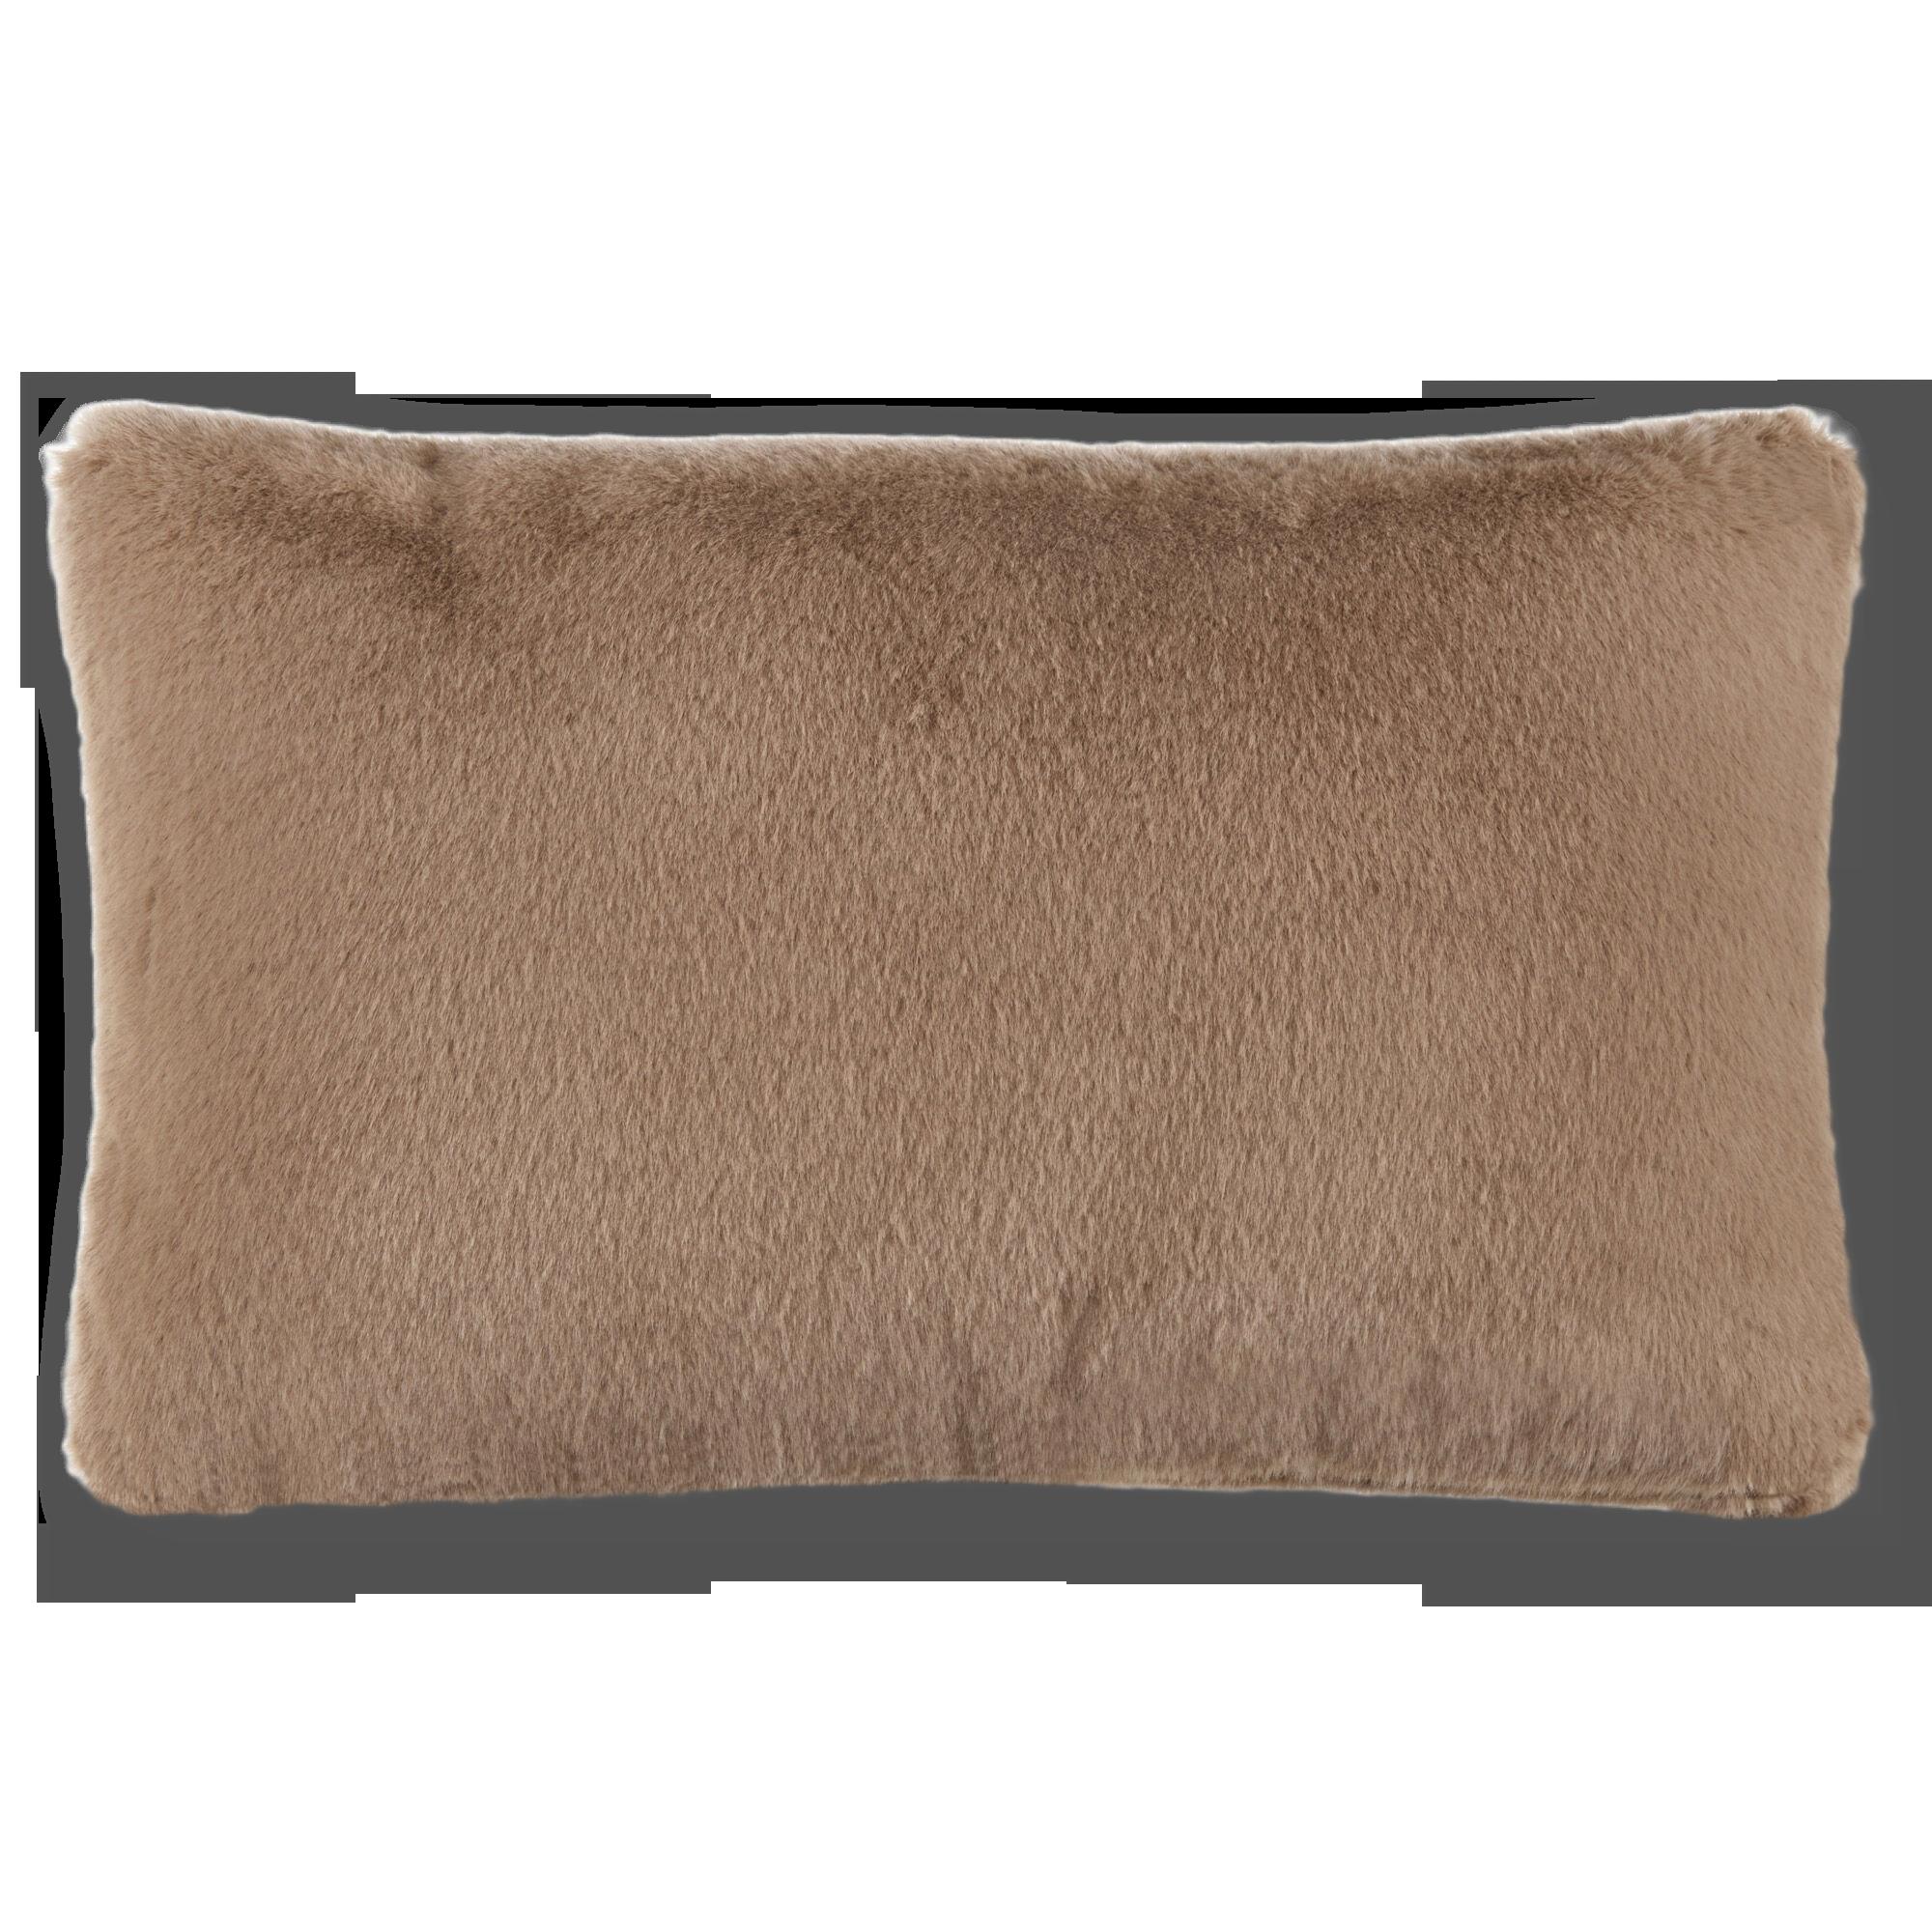 "Coyote Faux Fur Decorative Lumbar Pillow 14"" X 22"""